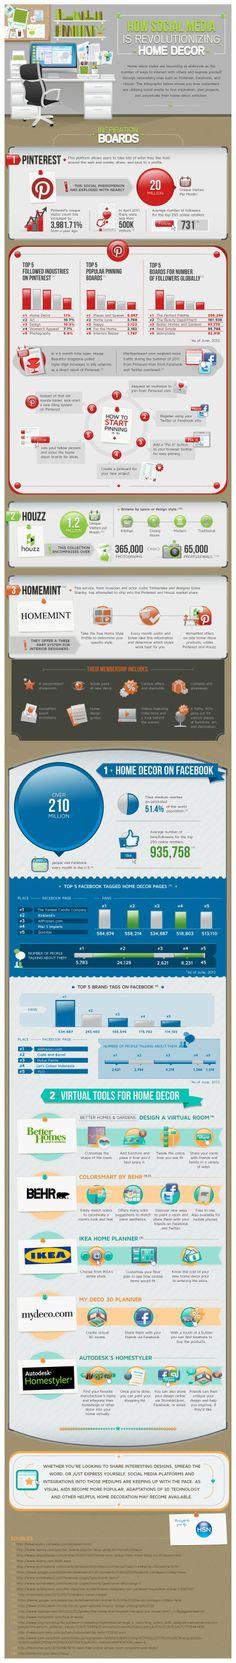 How Social Media Is Revolutionizing Home Decor [INFOGRAPHIC] #socialmedia #homedecor